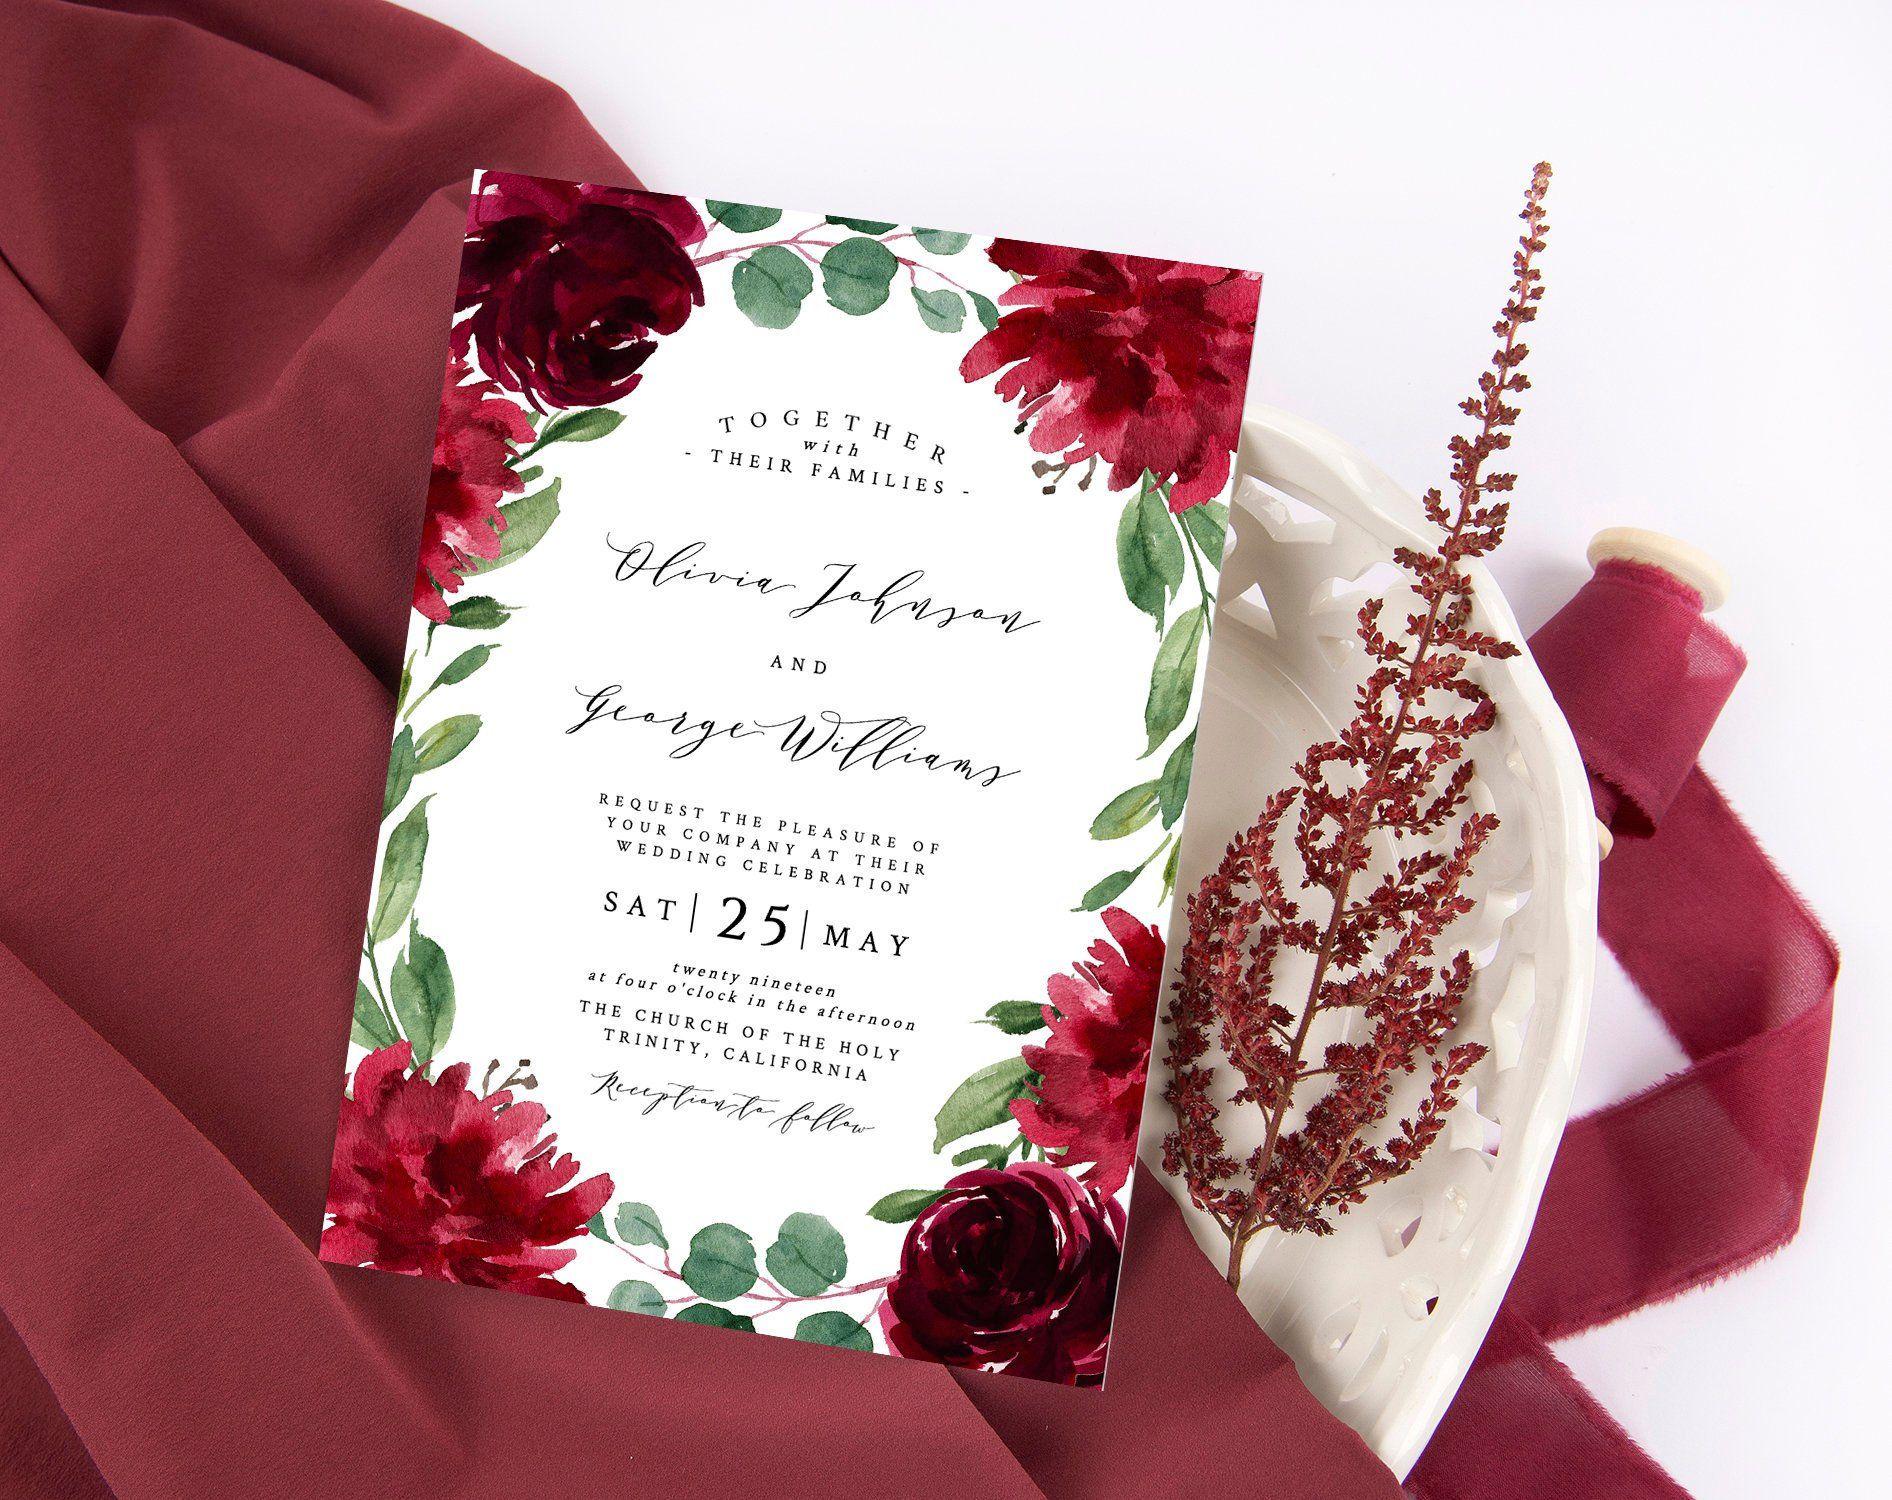 Burgundy wedding invitations suite, wedding invitation